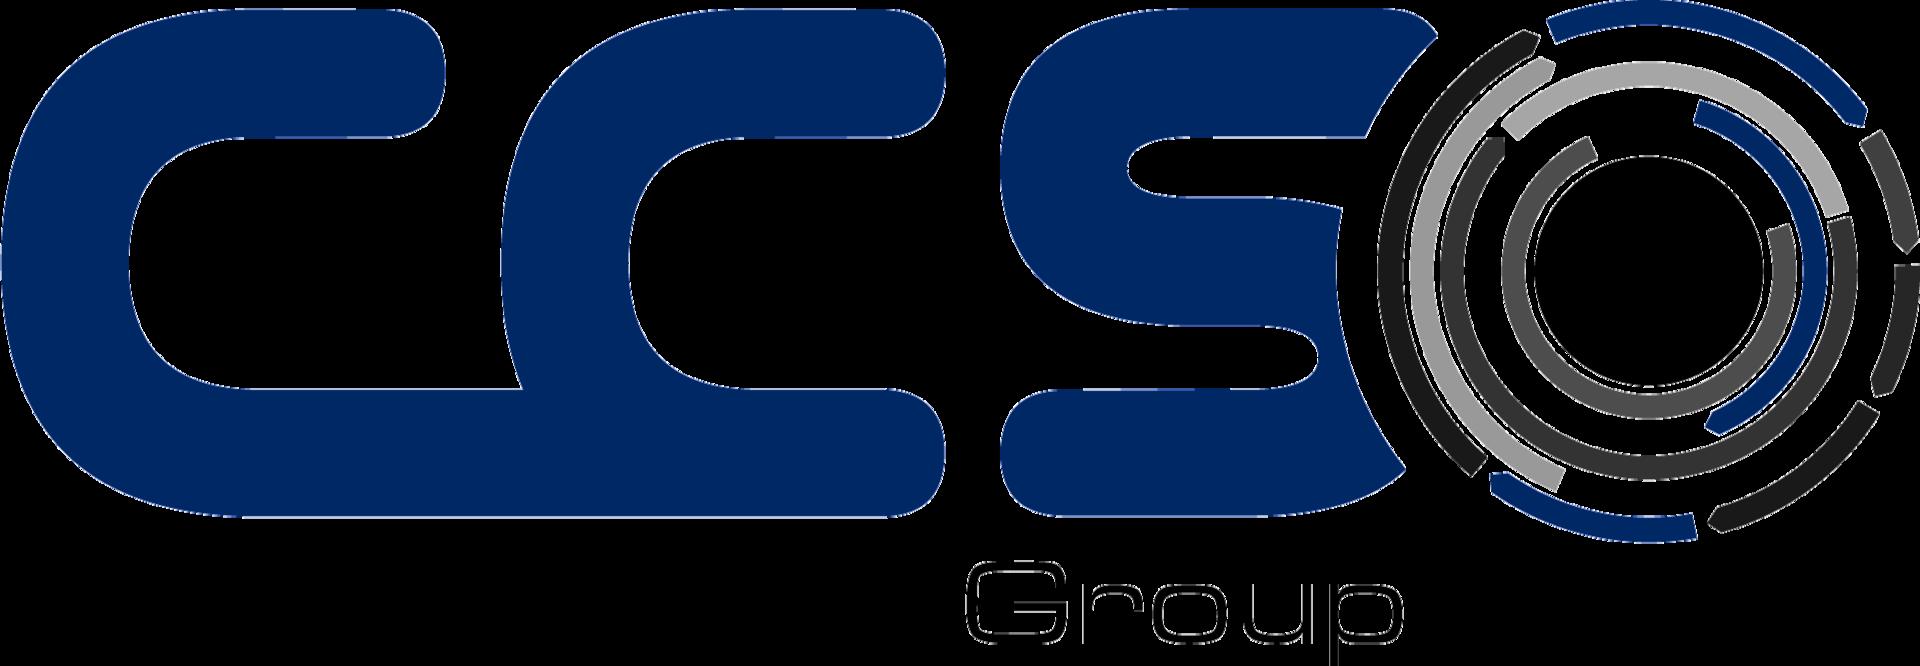 ccs gruppe � wikipedia